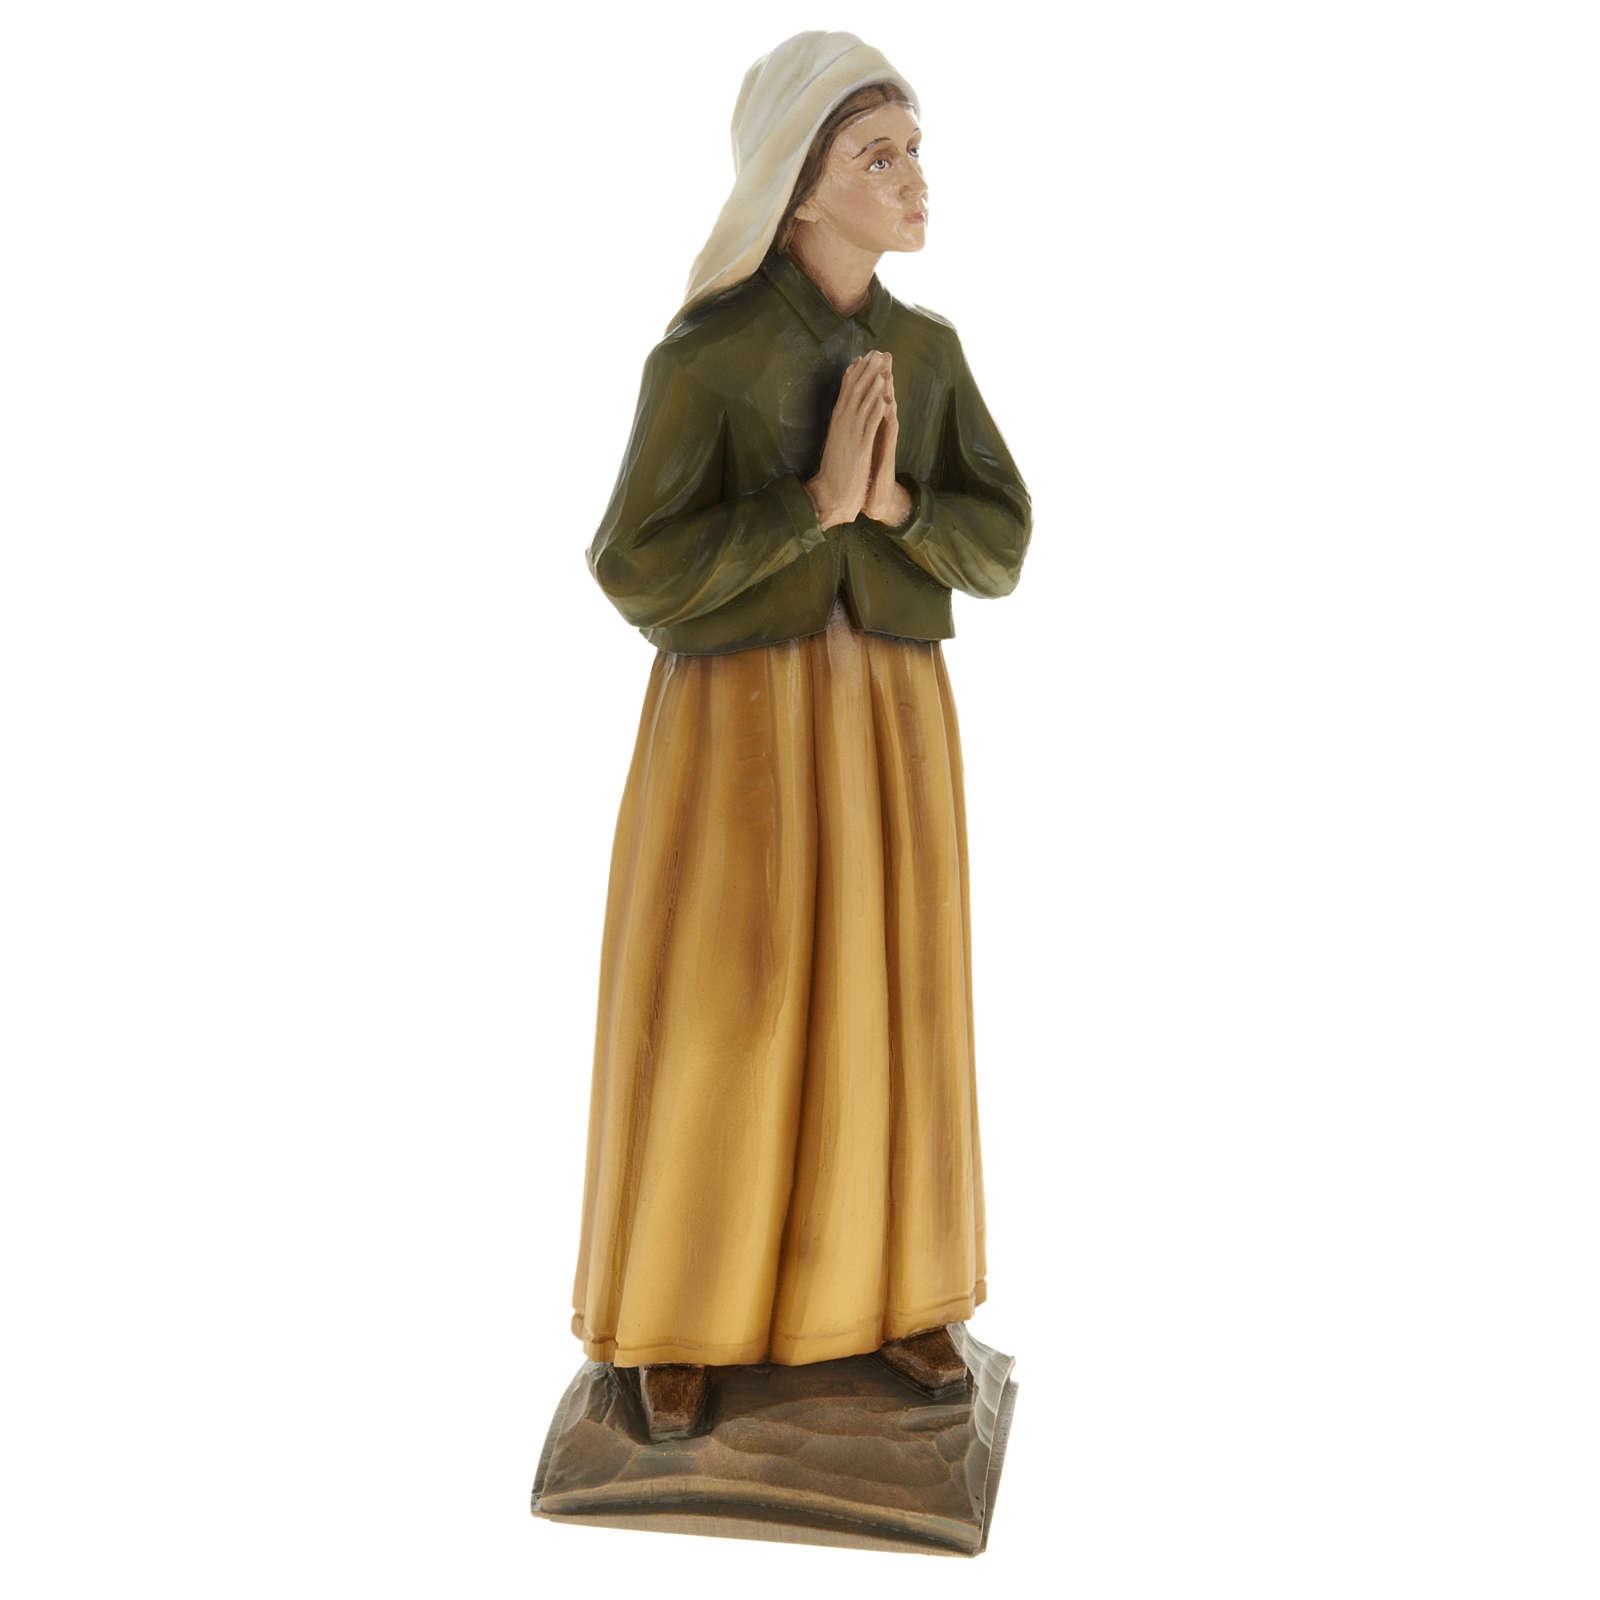 Bergers de Fatima statues 35 cm marbre reconstitué 4